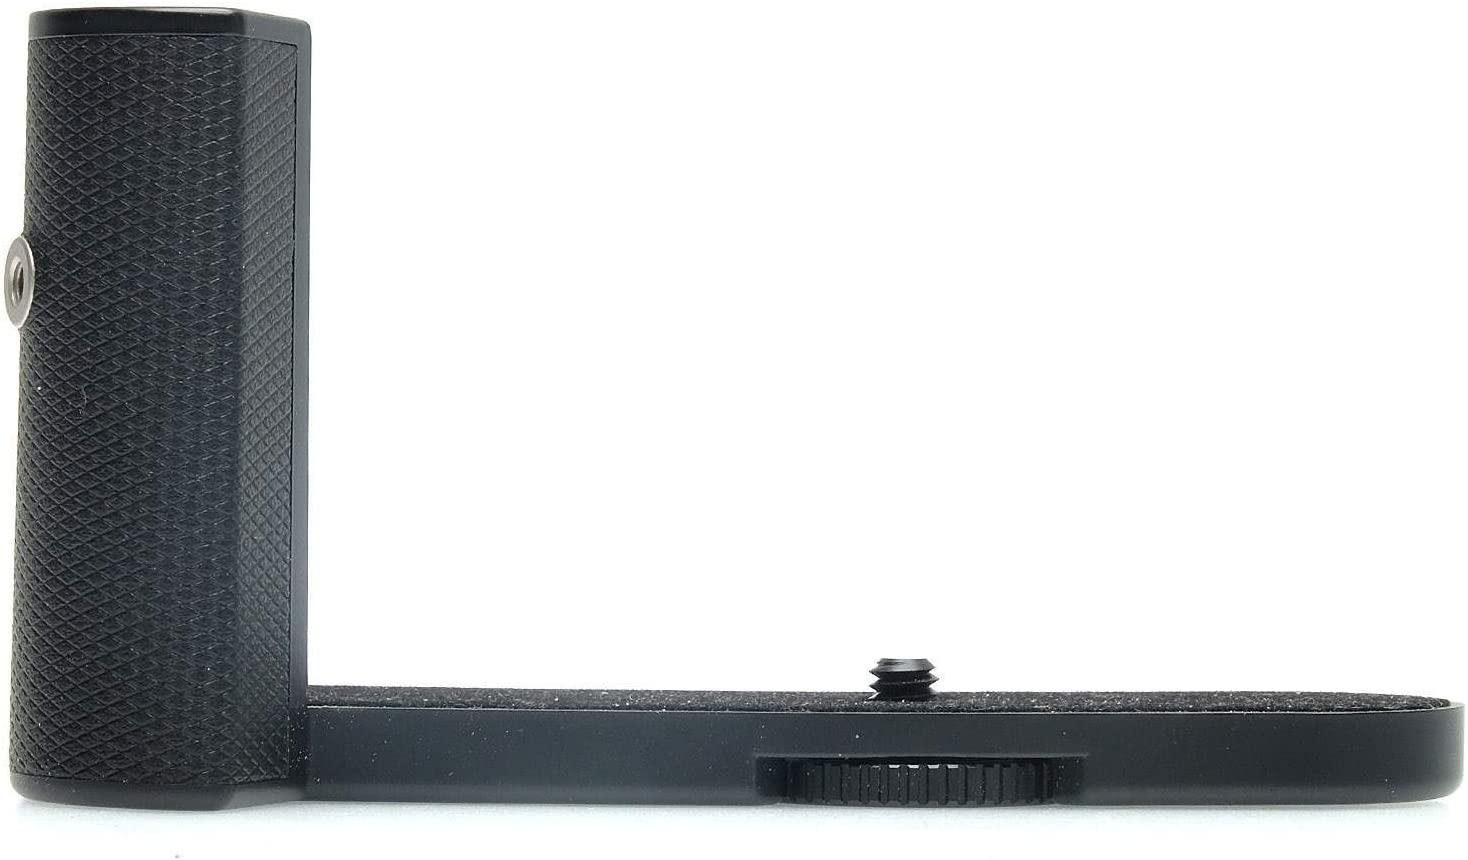 Leica Q Handgrip for Q Digital Camera (Black)